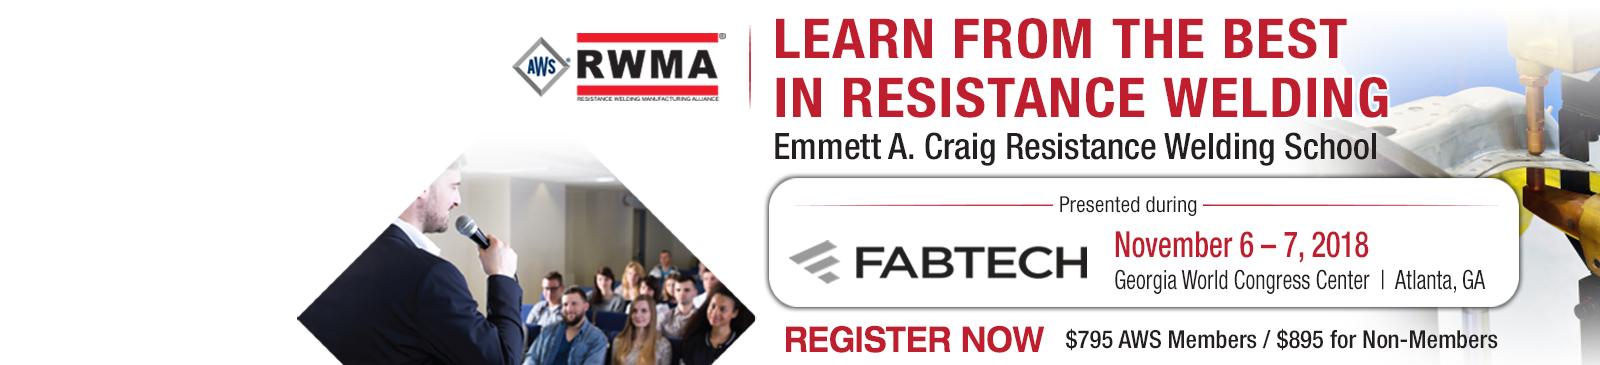 AWS RWMA Resistance Welding School